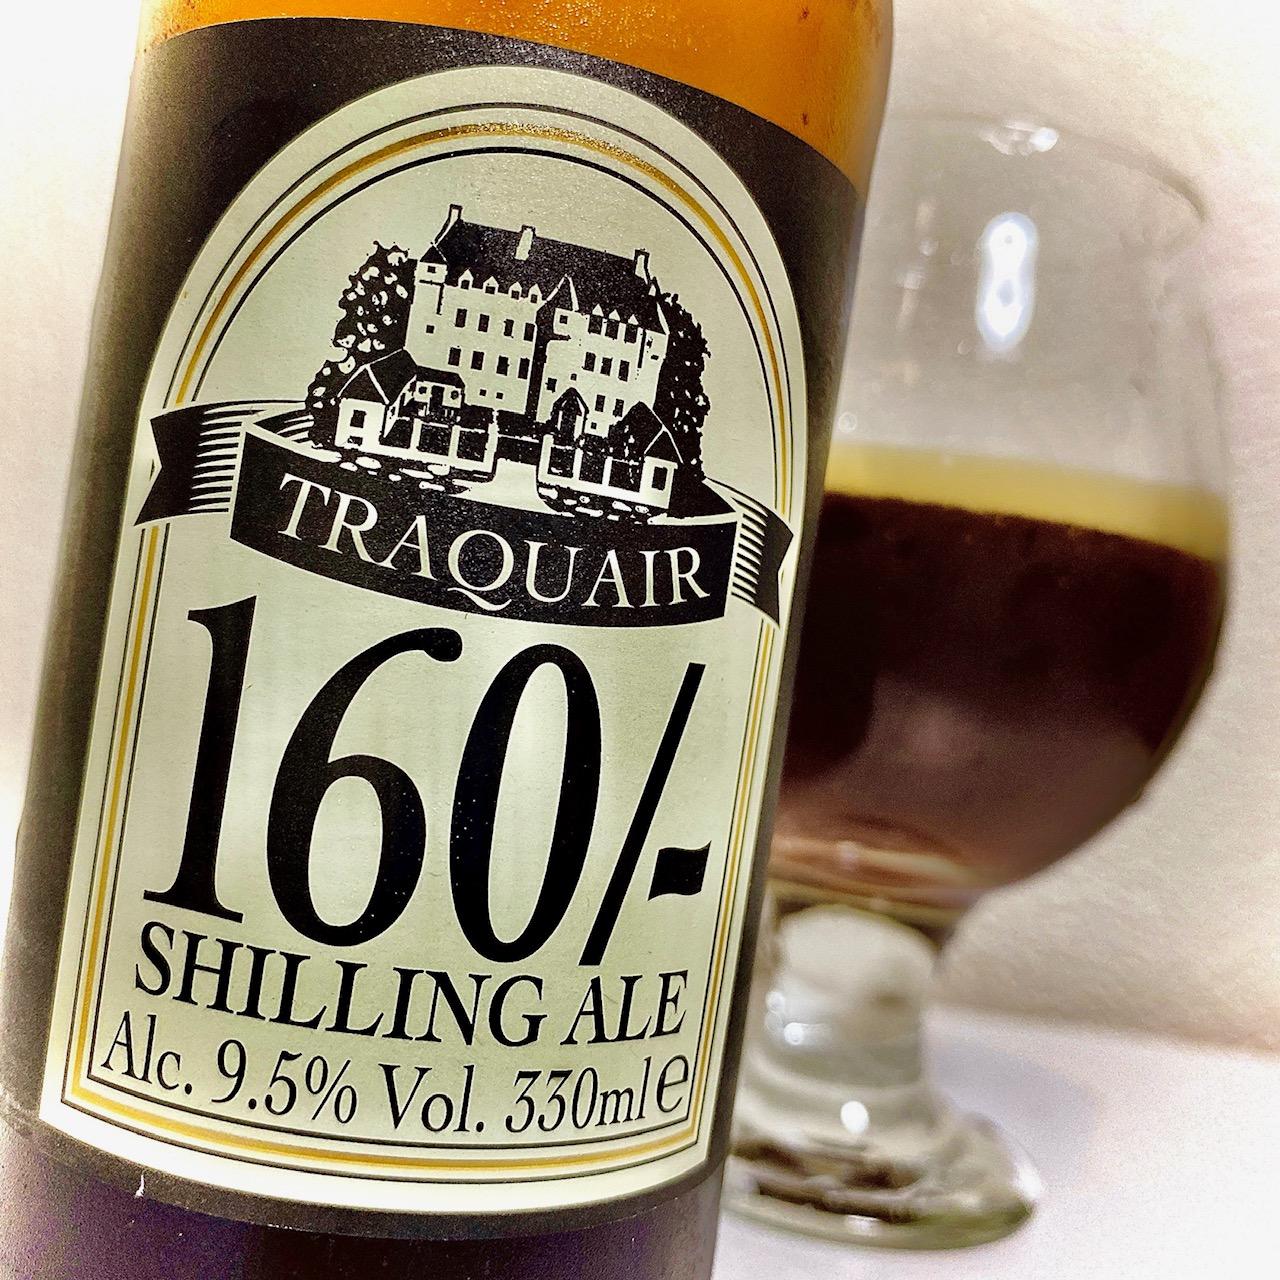 Traquair Brewery「トラクエア 160シリングエール」